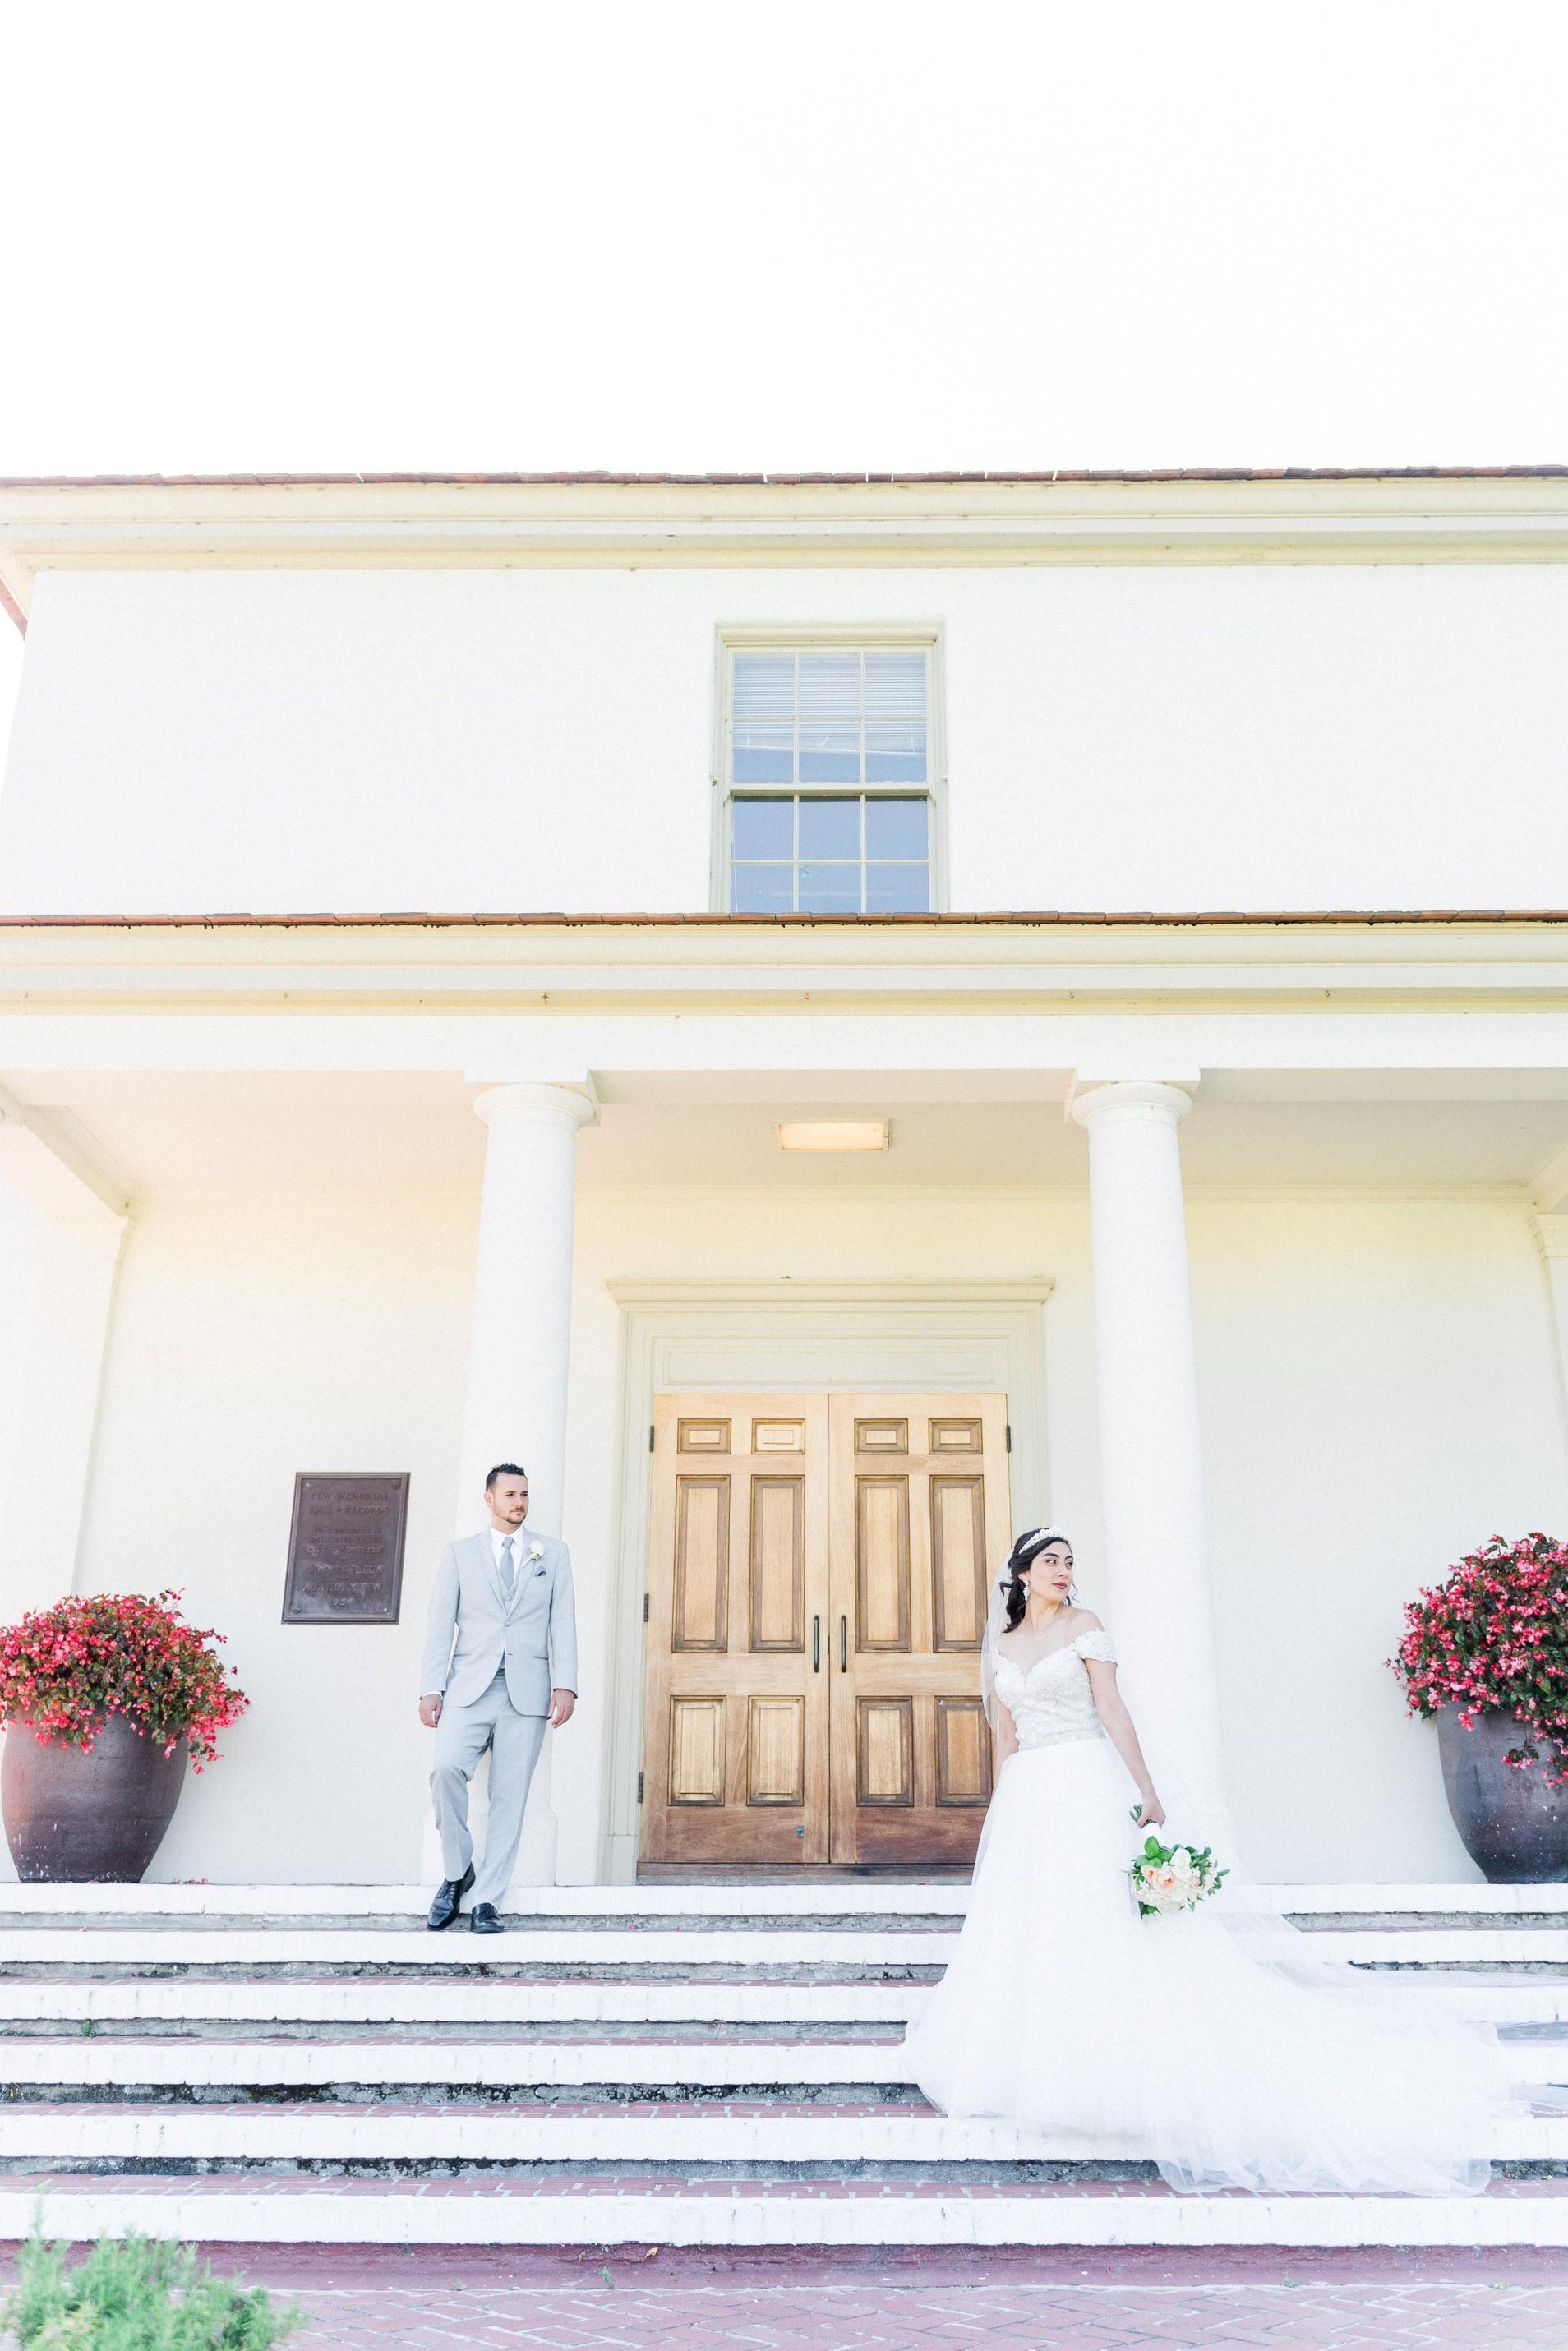 monterey-wedding-photographer-caitlin-steven-drew-zavala-5.jpg